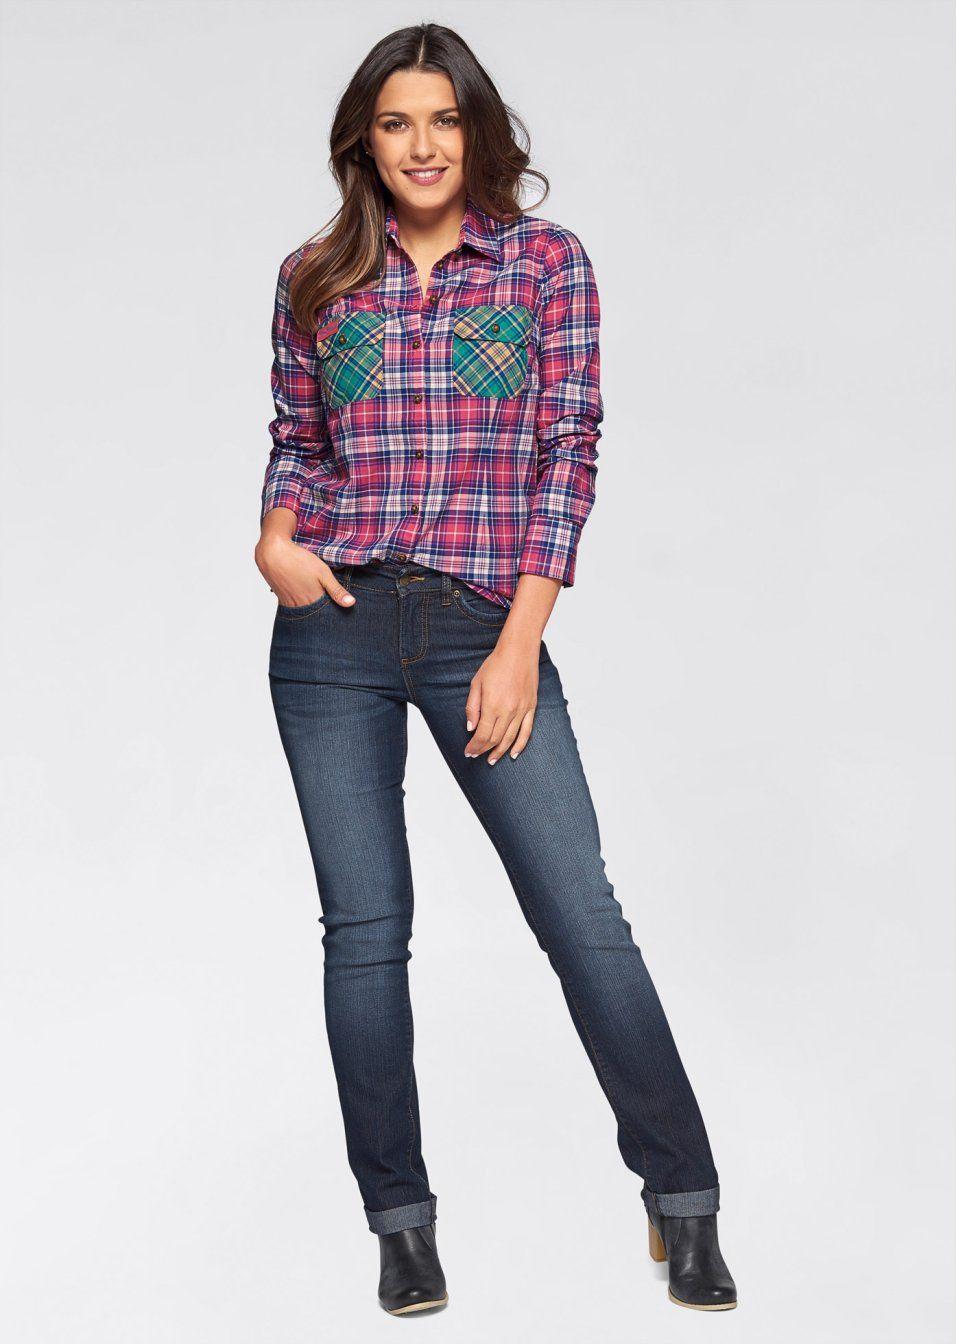 Bluzka W Krate Dlugi Rekaw Z 54 99 Zl Bonprix Womens Plaid Fashion Women S Plaid Shirt